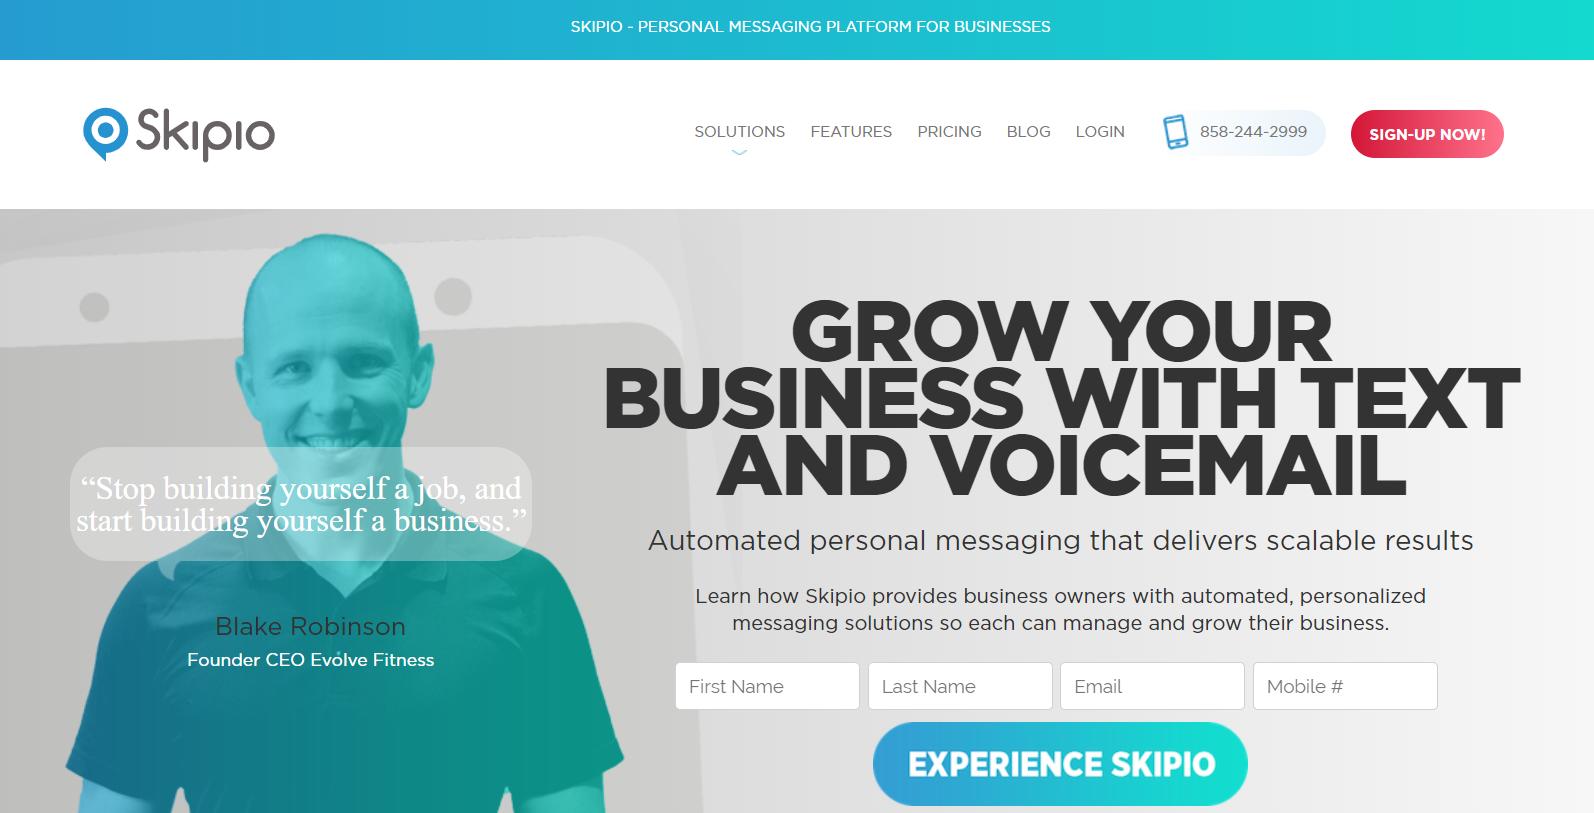 Skipio Review- Messaging Platform